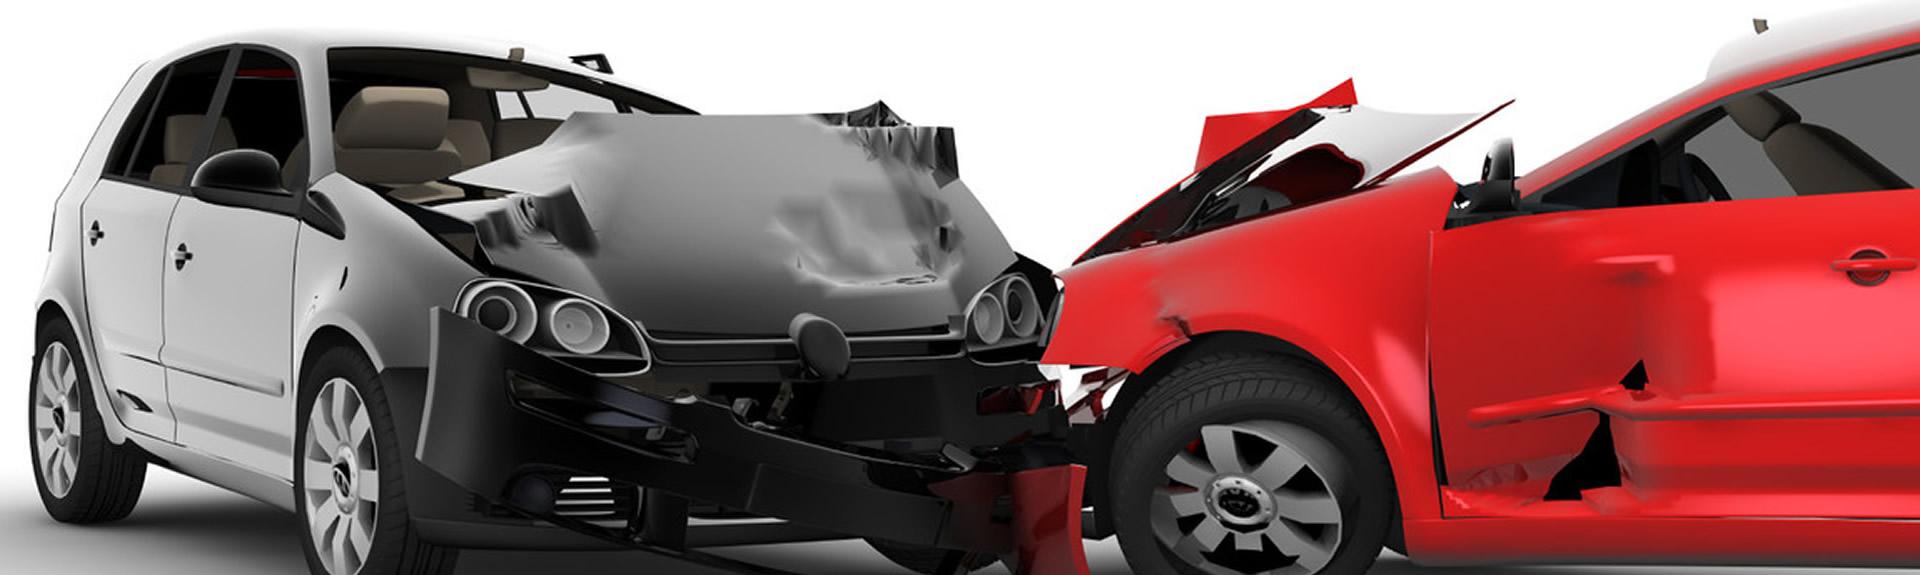 assicurazione assistenza stradale